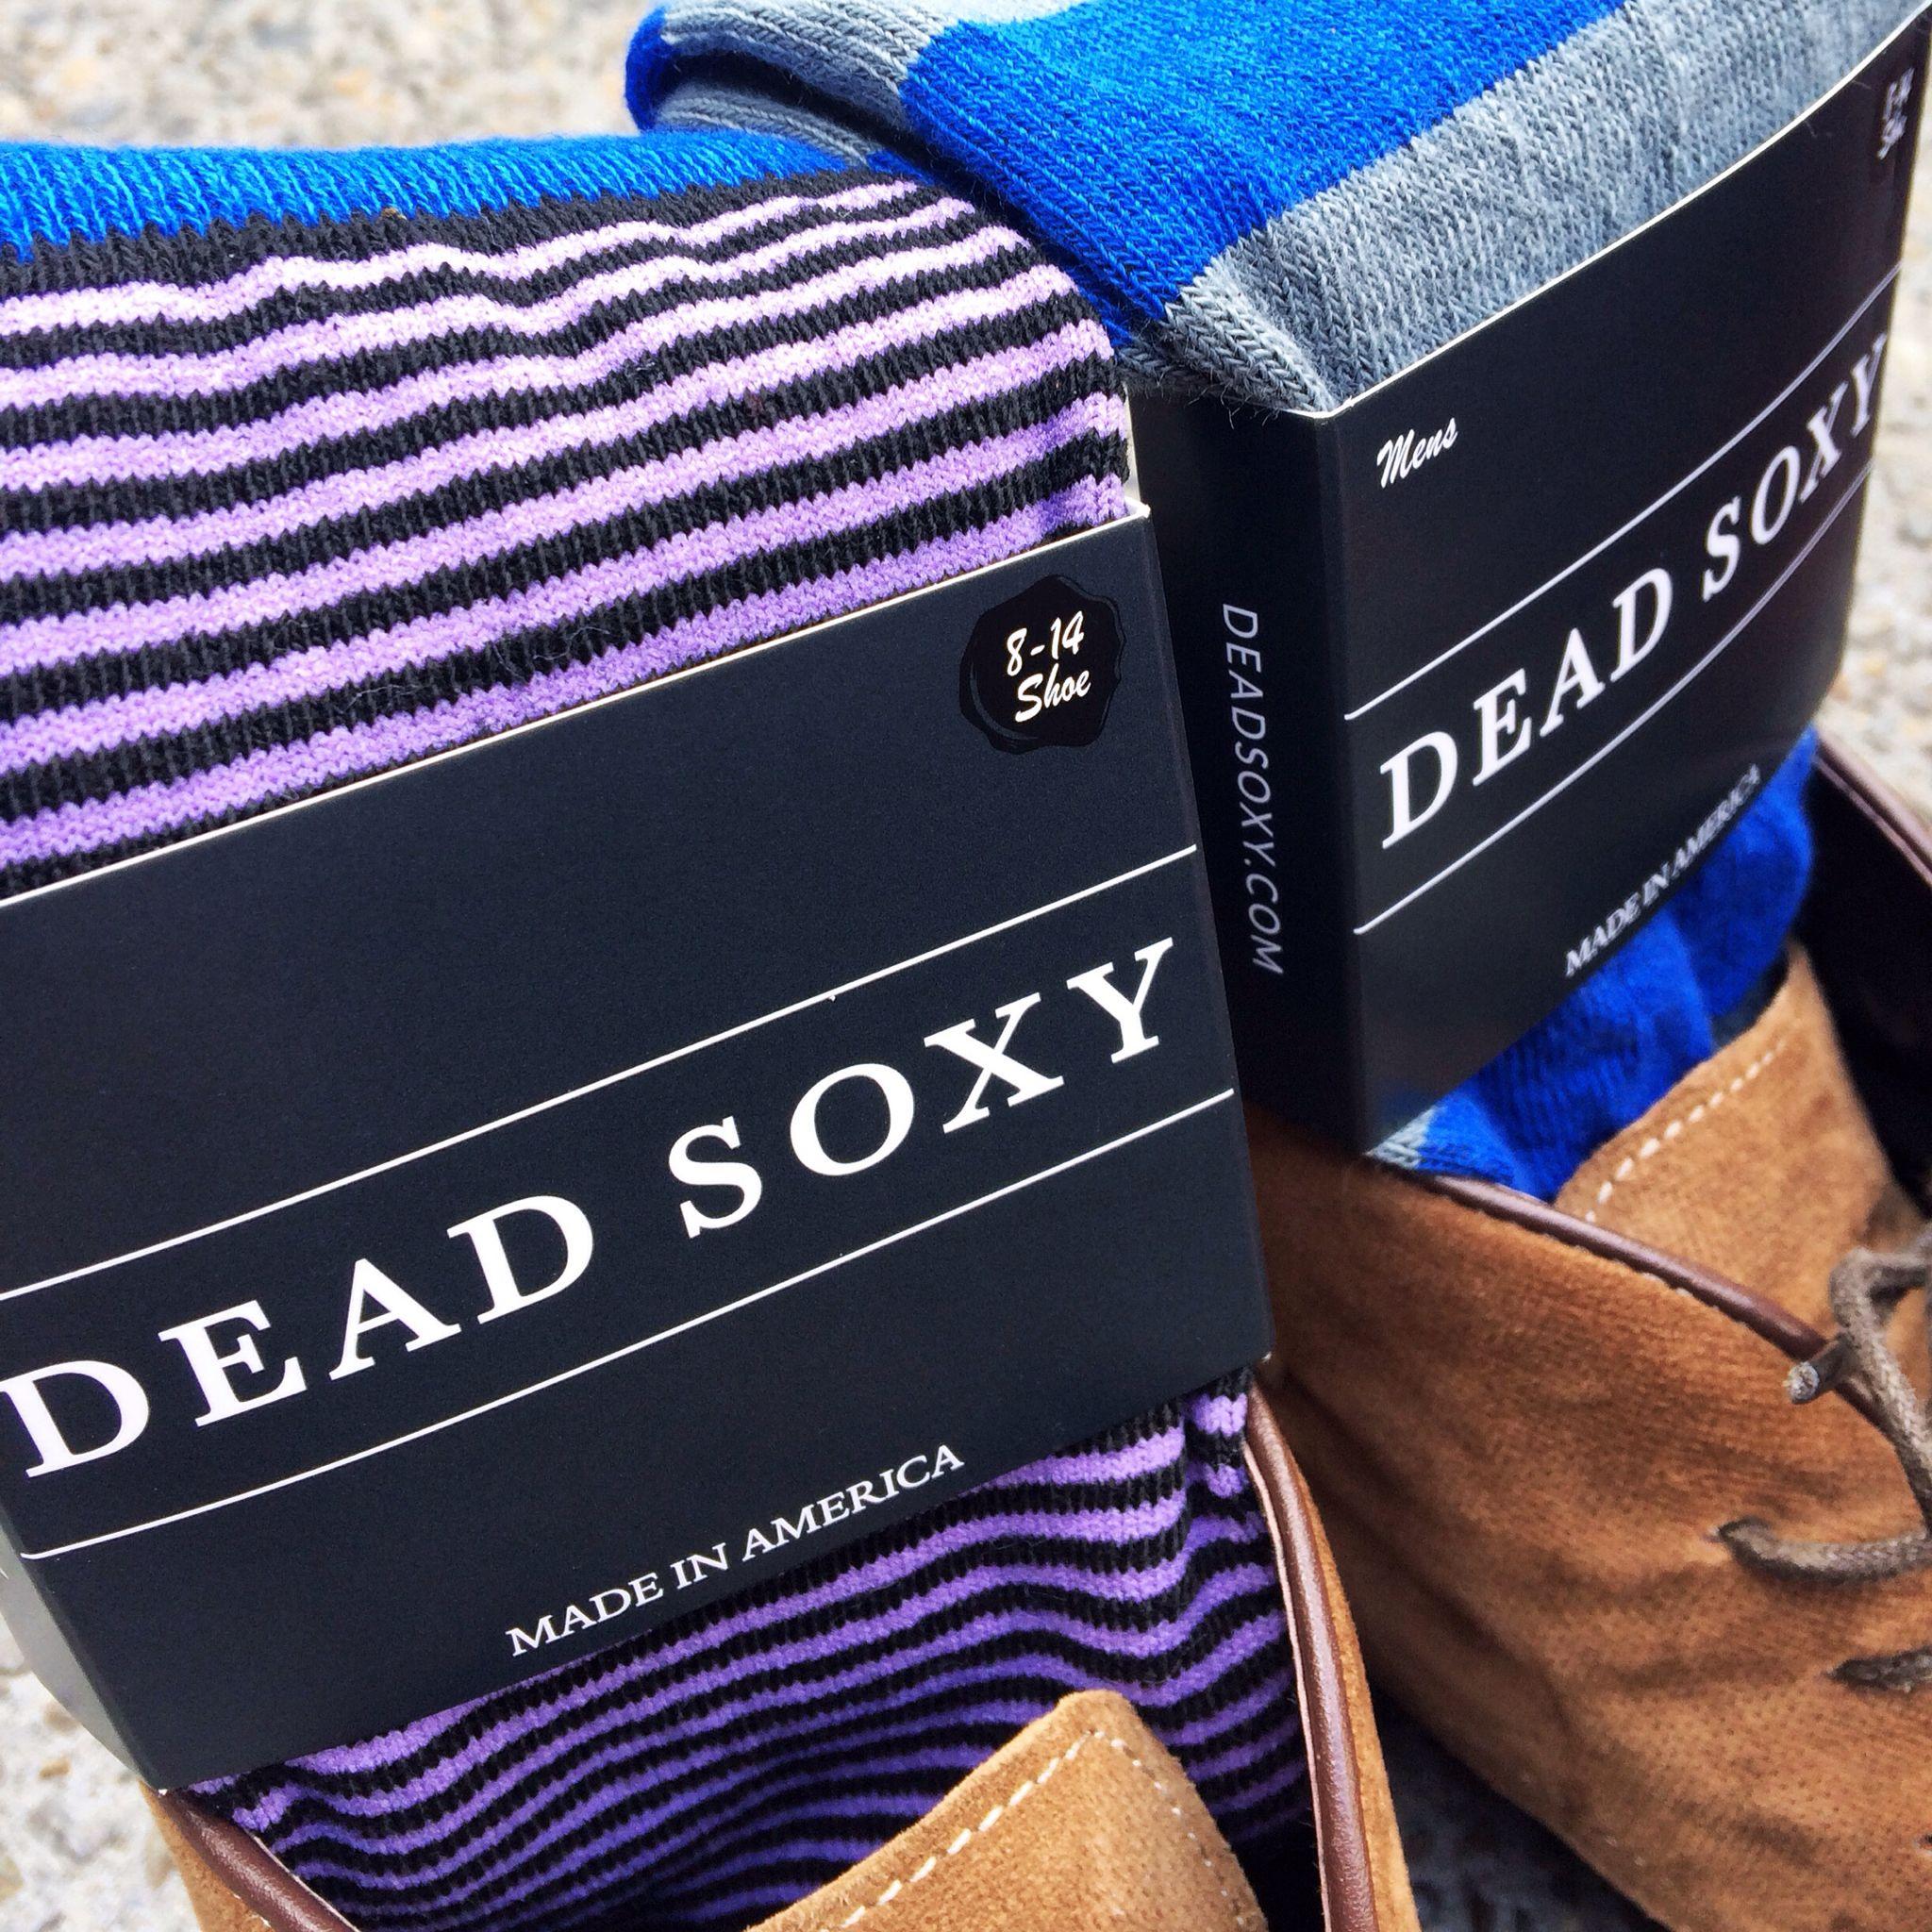 Dead Soxy Socks, style for the executive, classy fun.